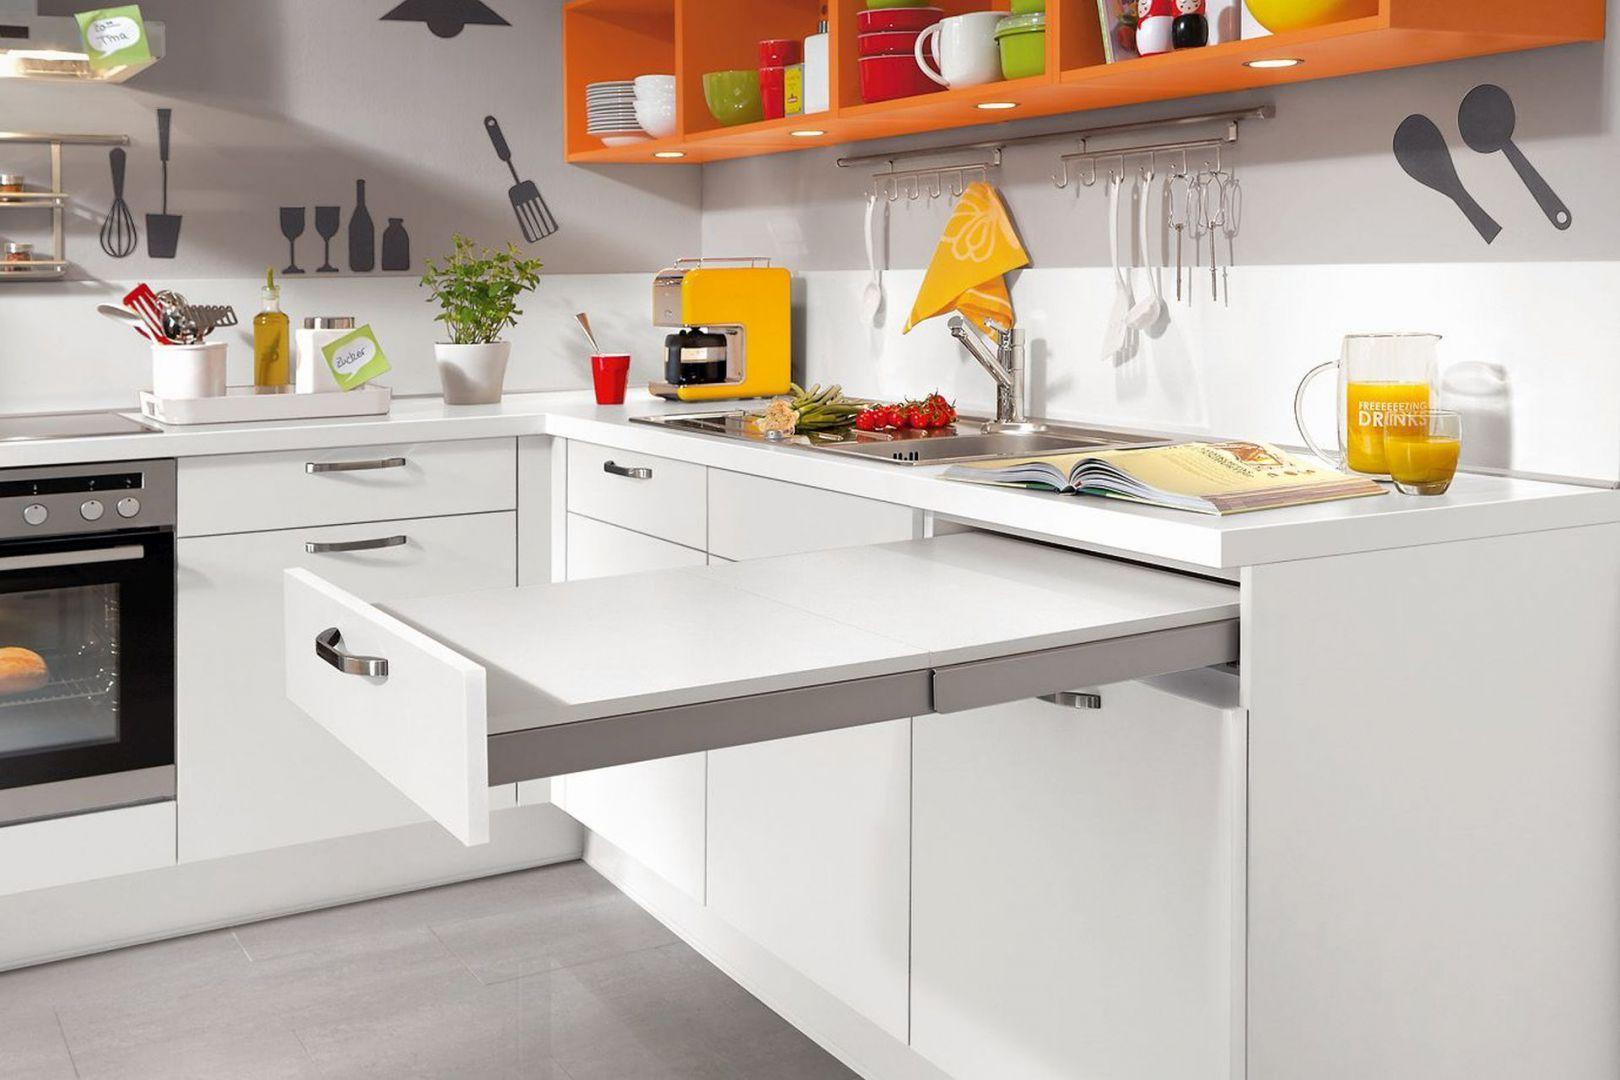 Wysuwany Blat Ktory Kitchen Room Design Kitchen Cabinet Design Kitchen Interior